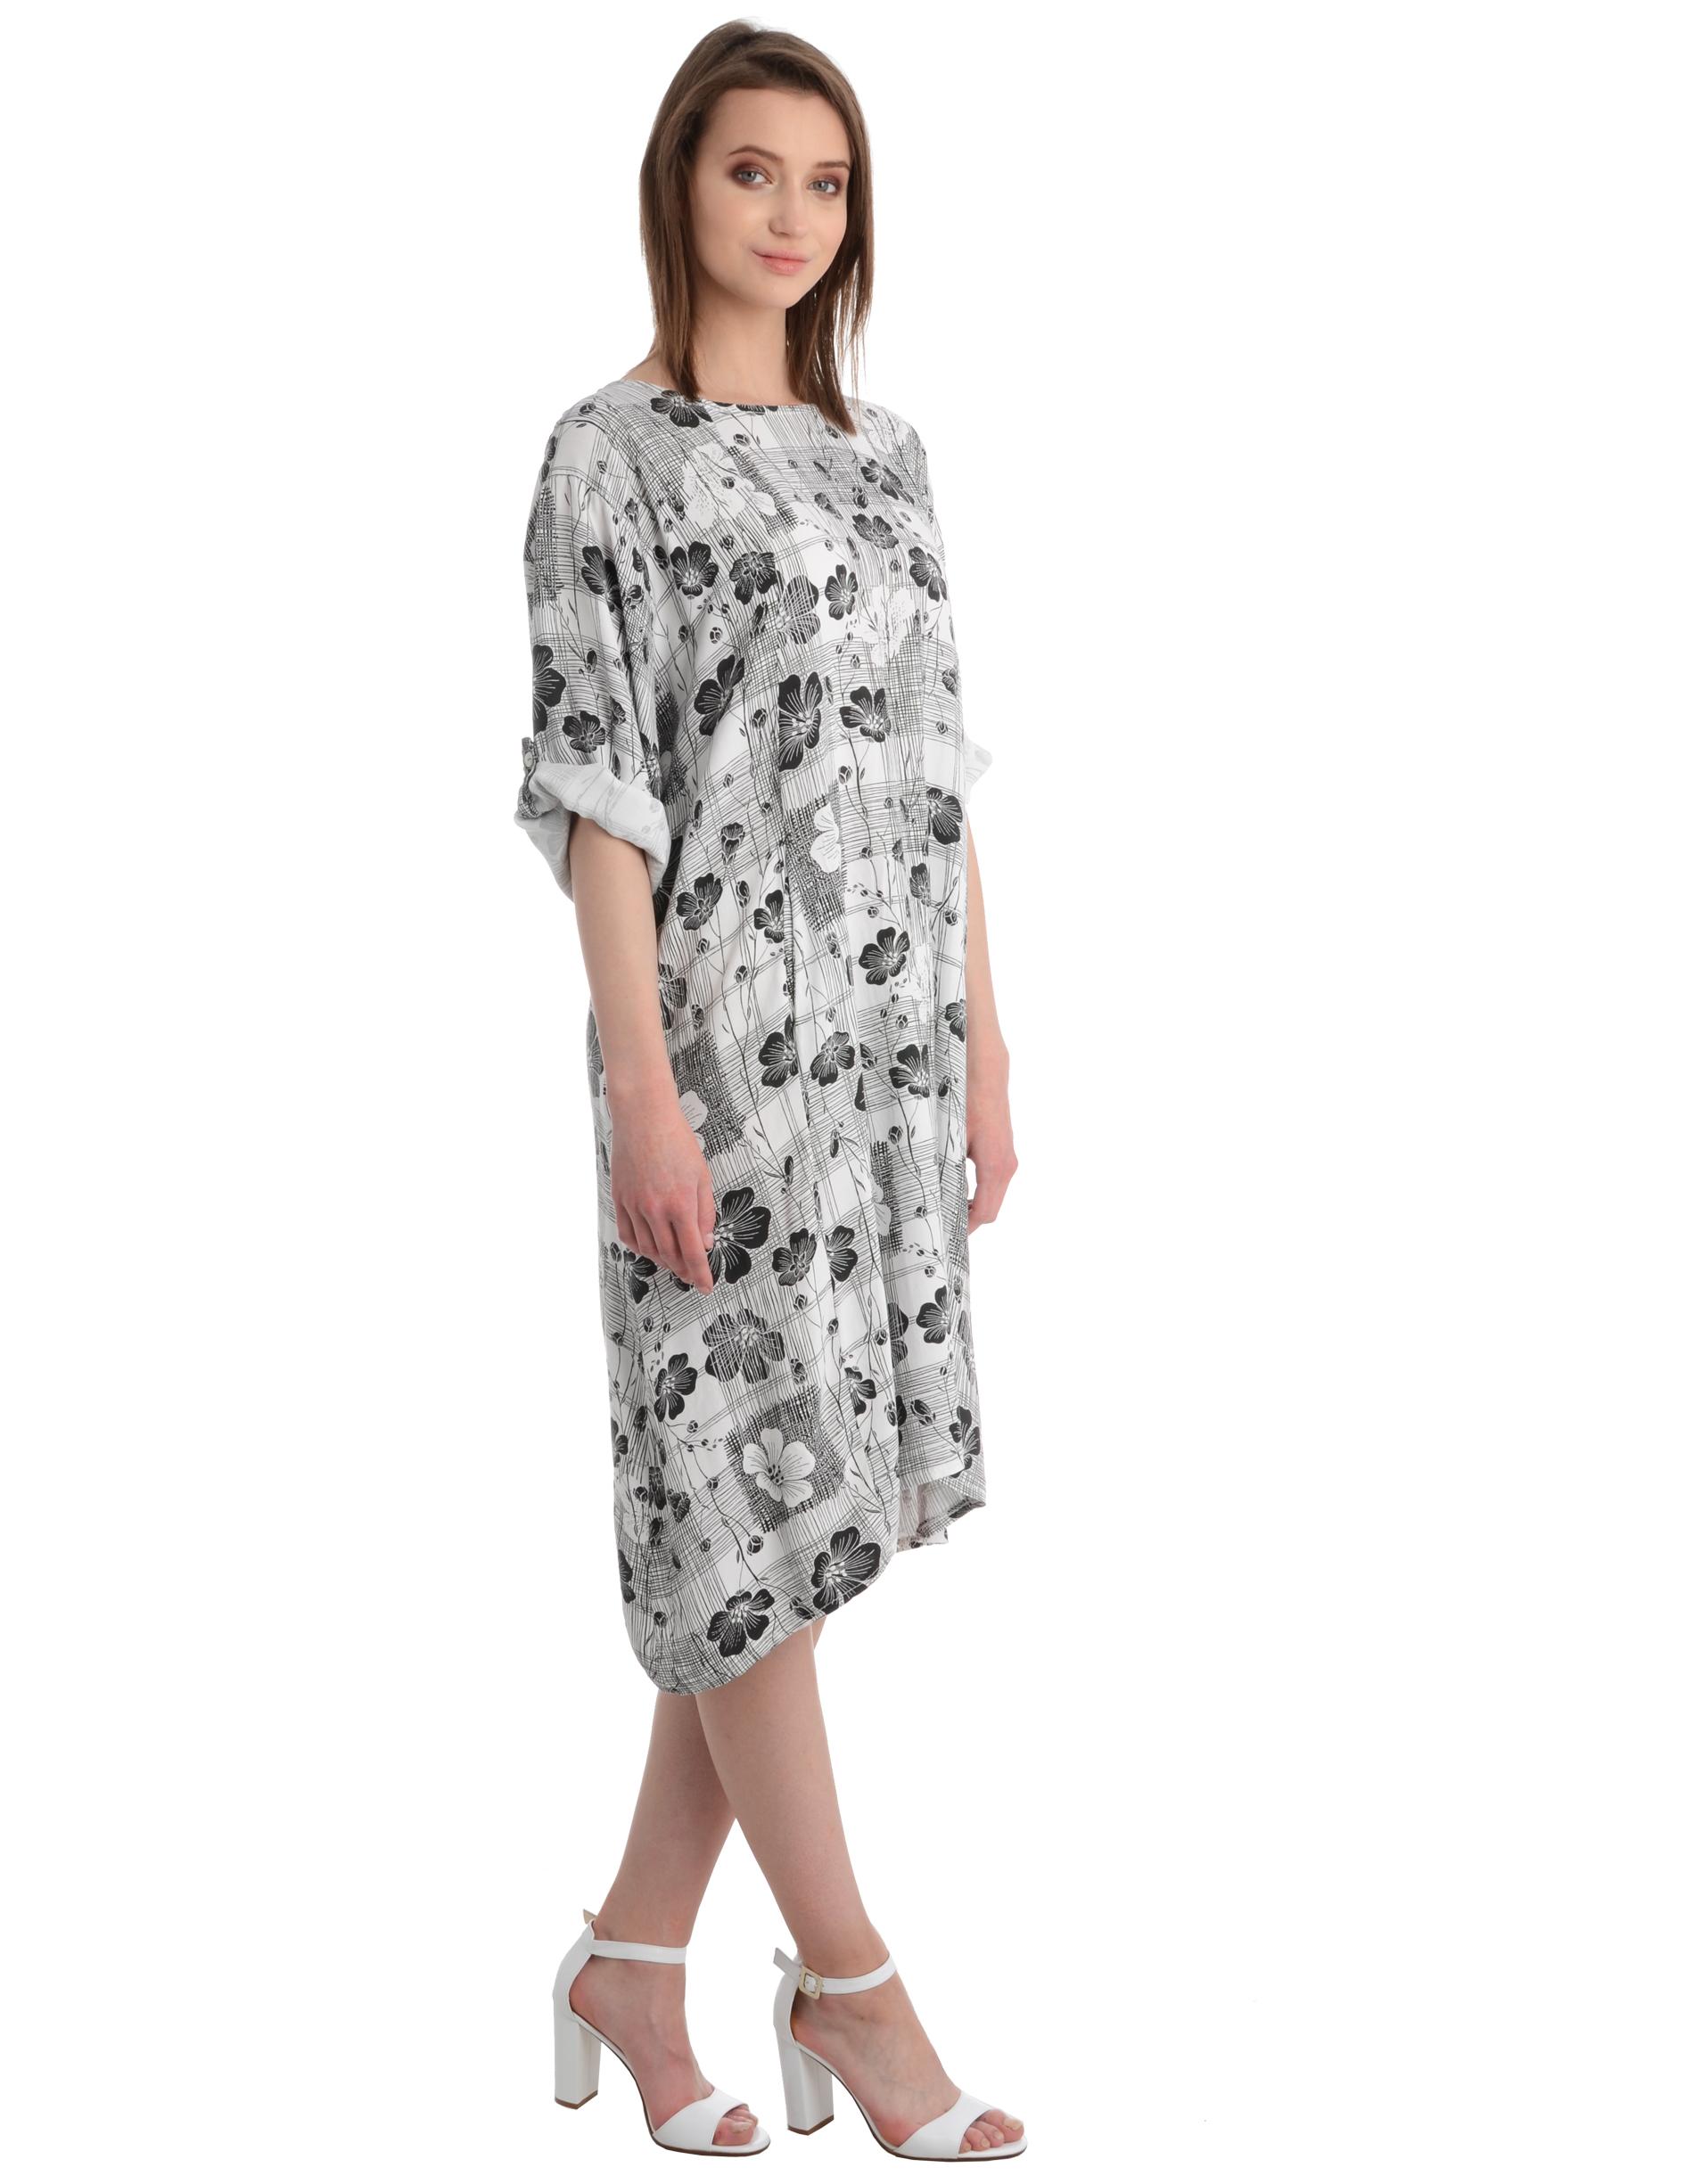 Sukienka - 75-1333 BIANC - Unisono